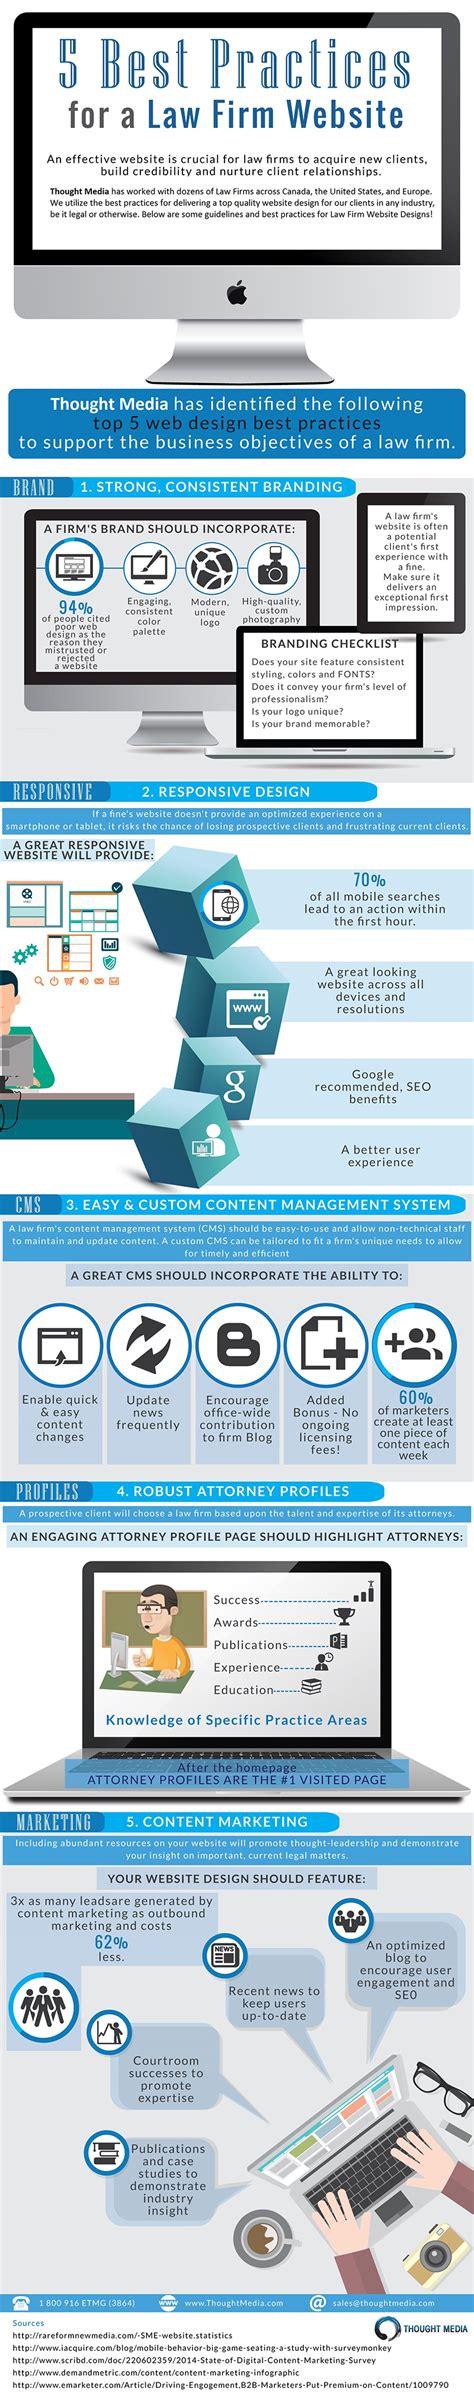 firm web designer firm website design 5 best practices